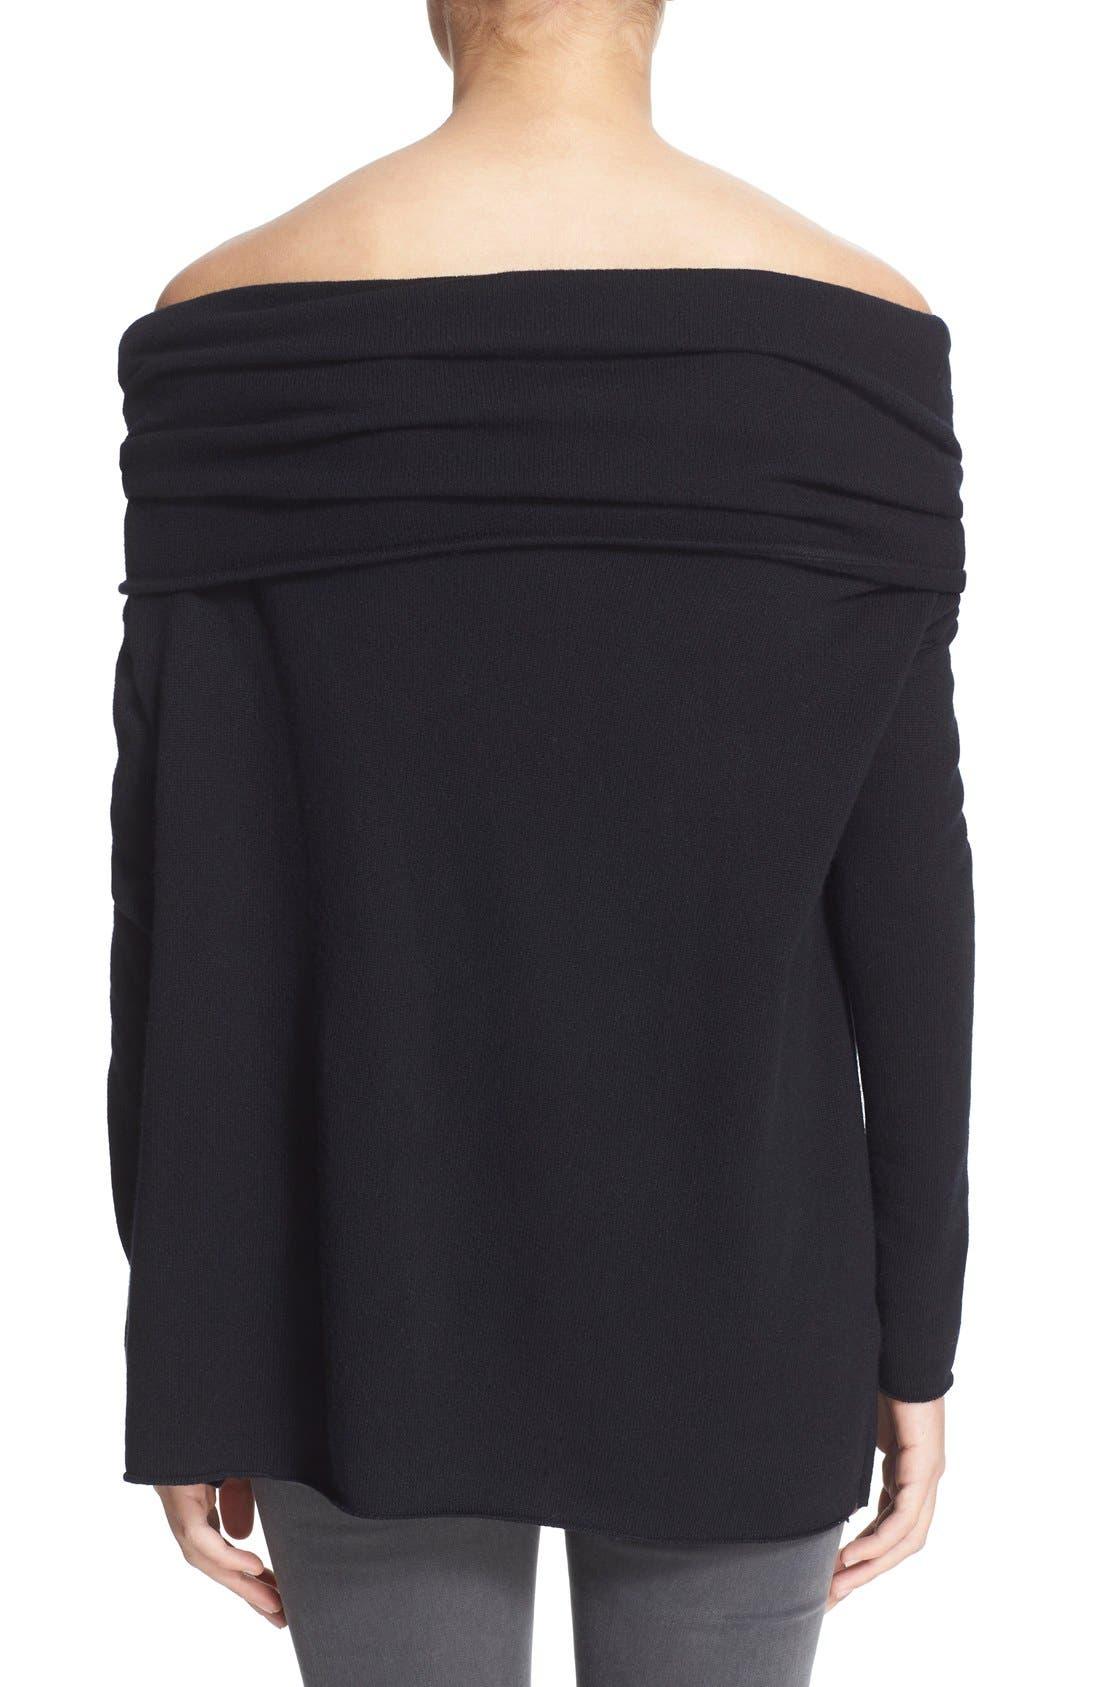 VINCE,                             Cashmere Off the Shoulder Pullover,                             Alternate thumbnail 3, color,                             001